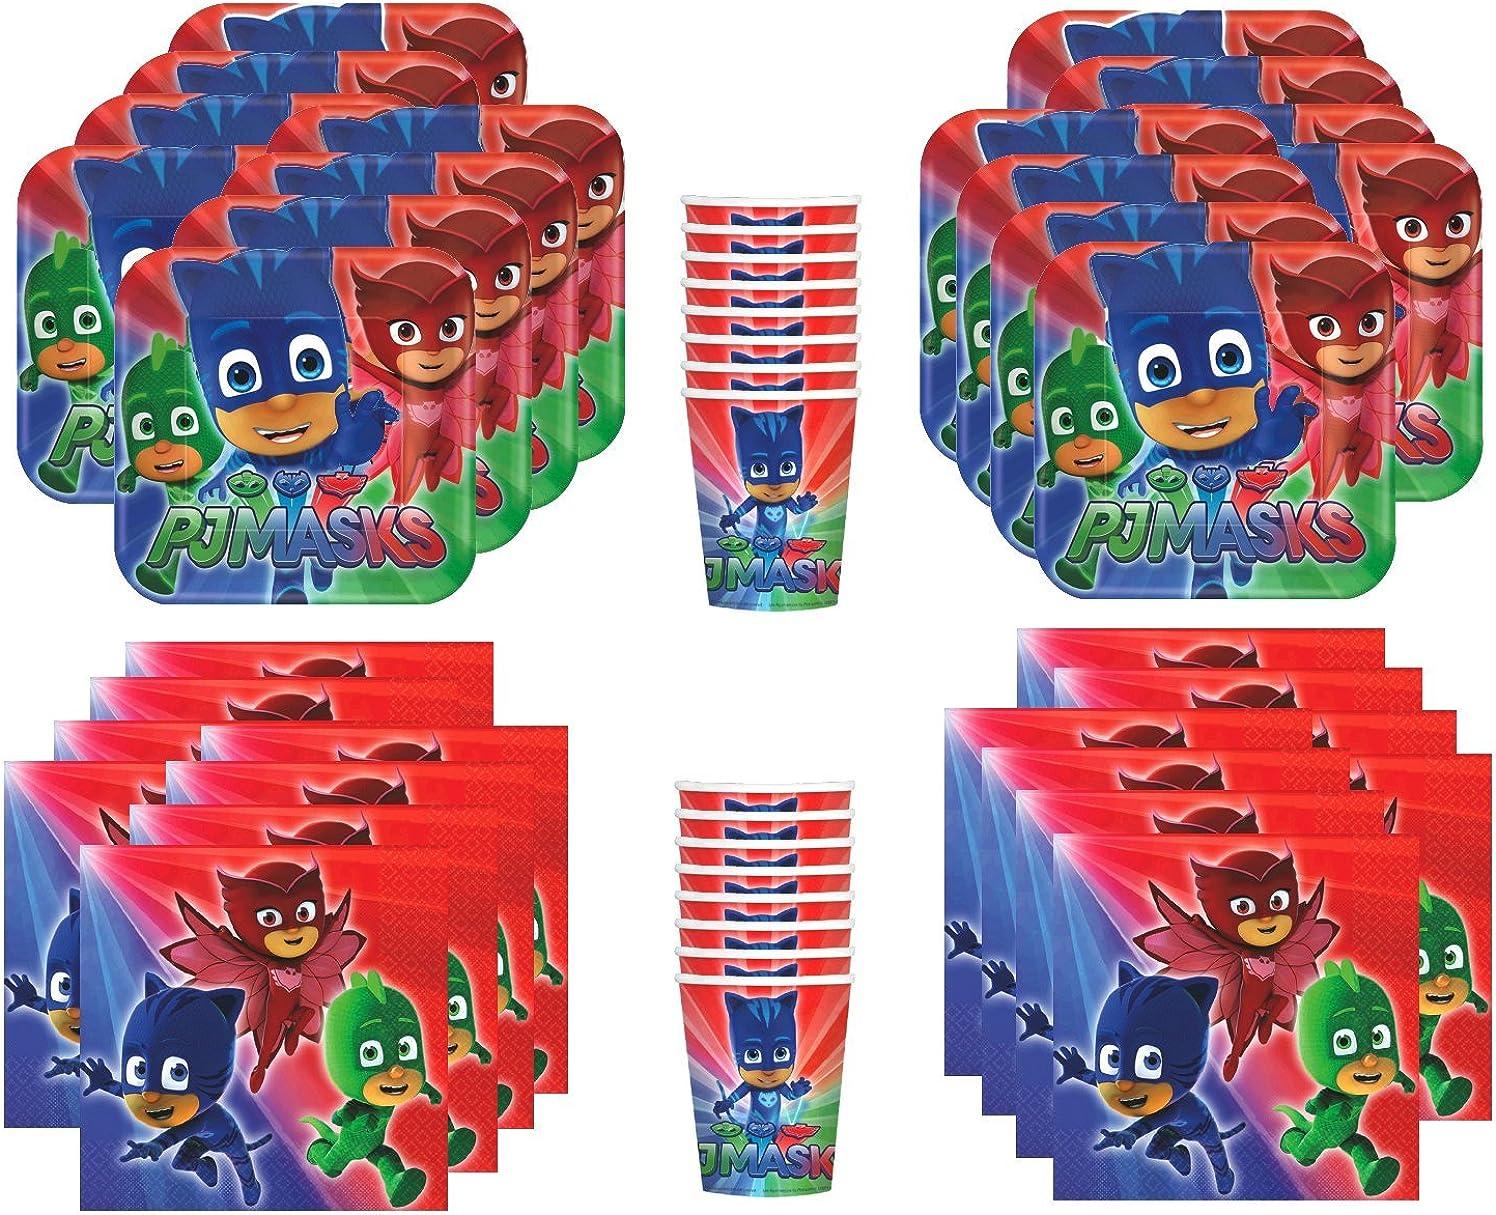 Amazon.com: PJ Masks, paquete suministro fiesta de ...